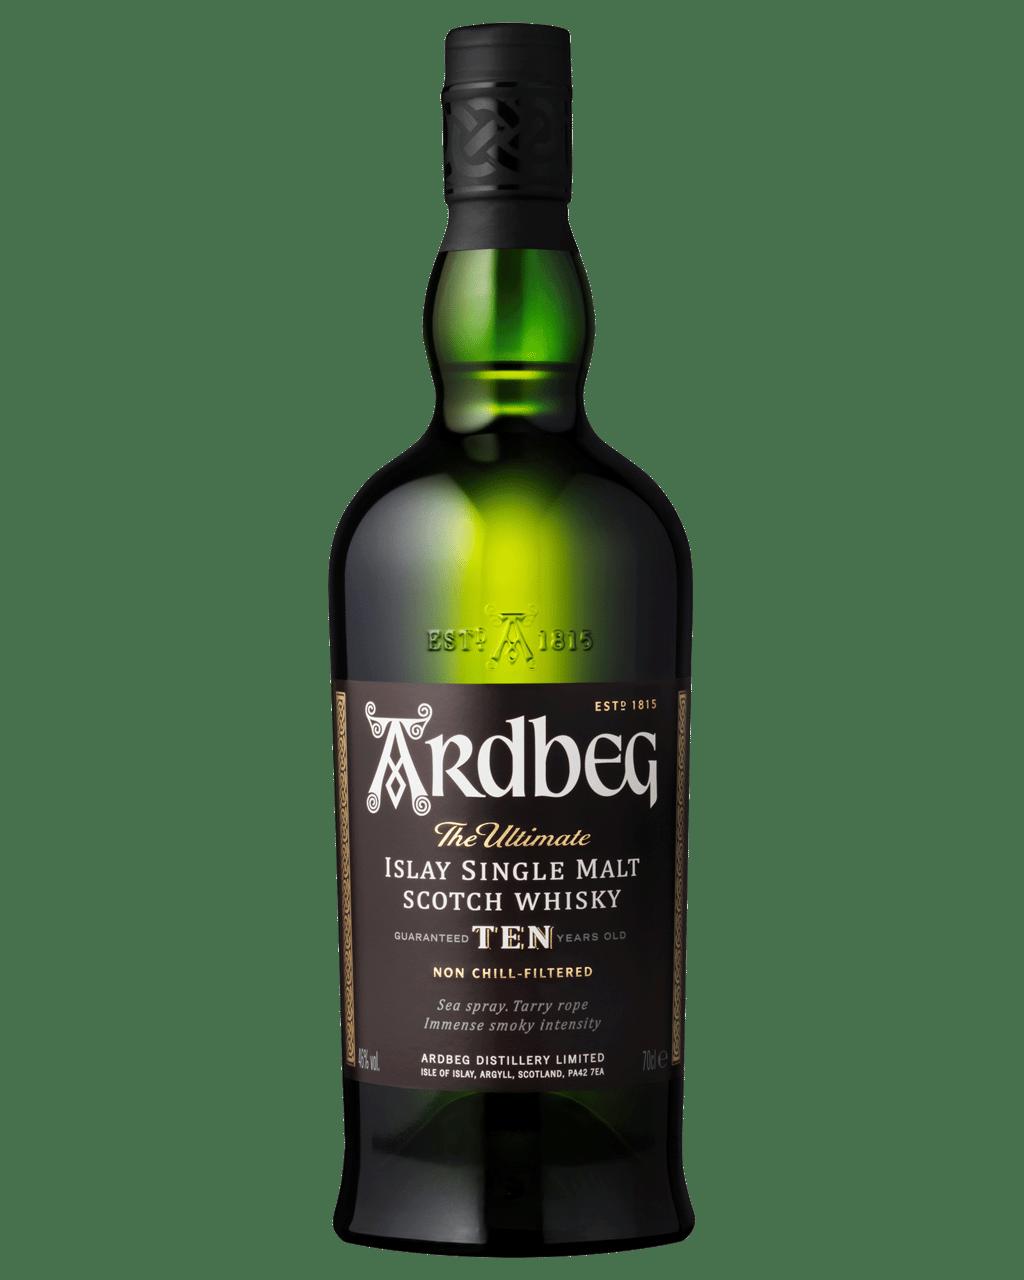 Buy Ardbeg 10 Year Islay Single Malt Scotch Whisky 700mL | Dan Murphy's Delivers